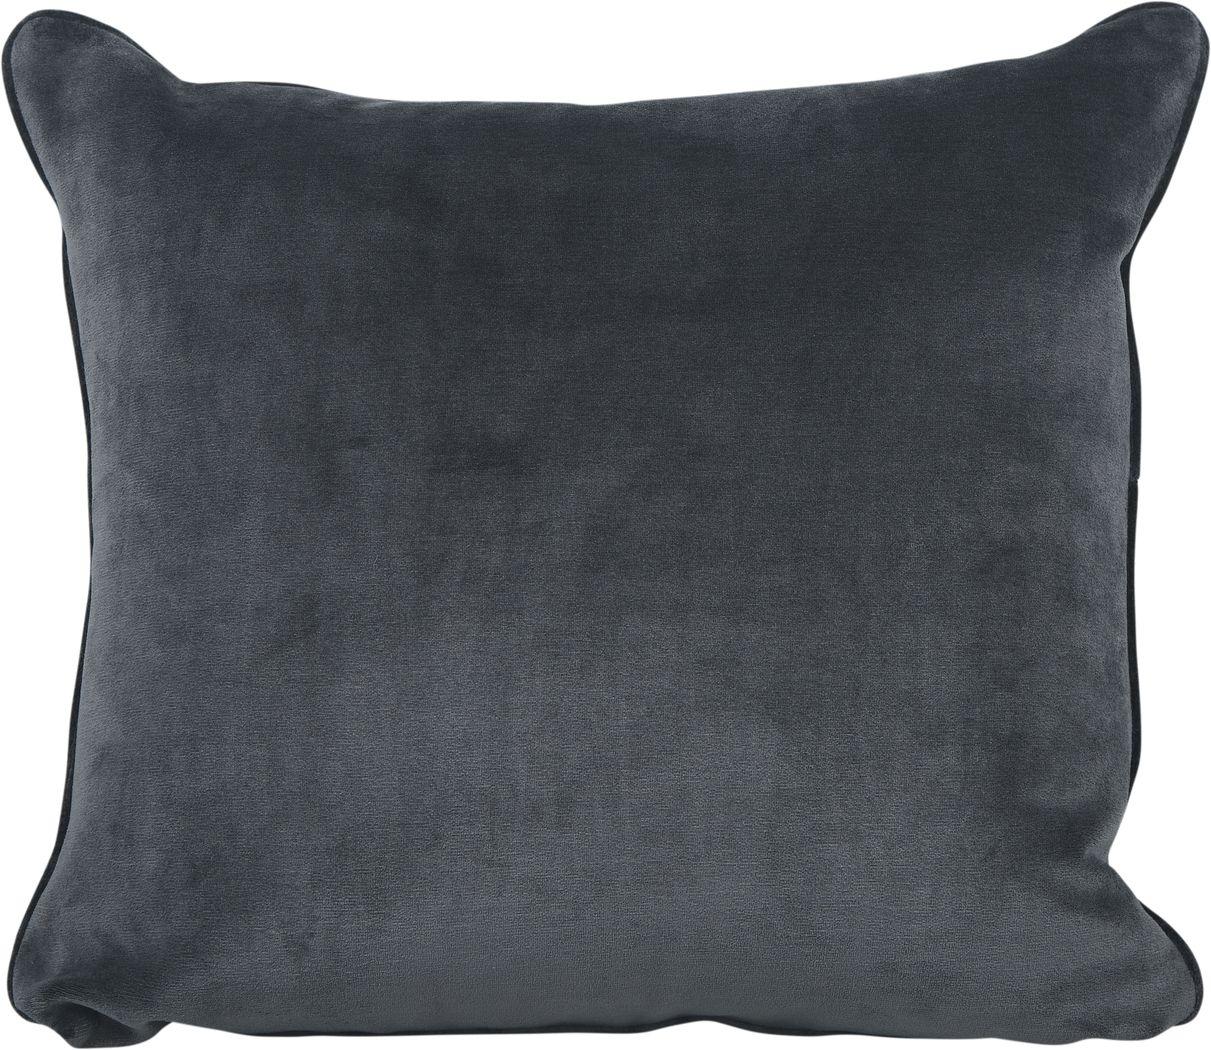 iSofa Romo Gray Accent Pillow